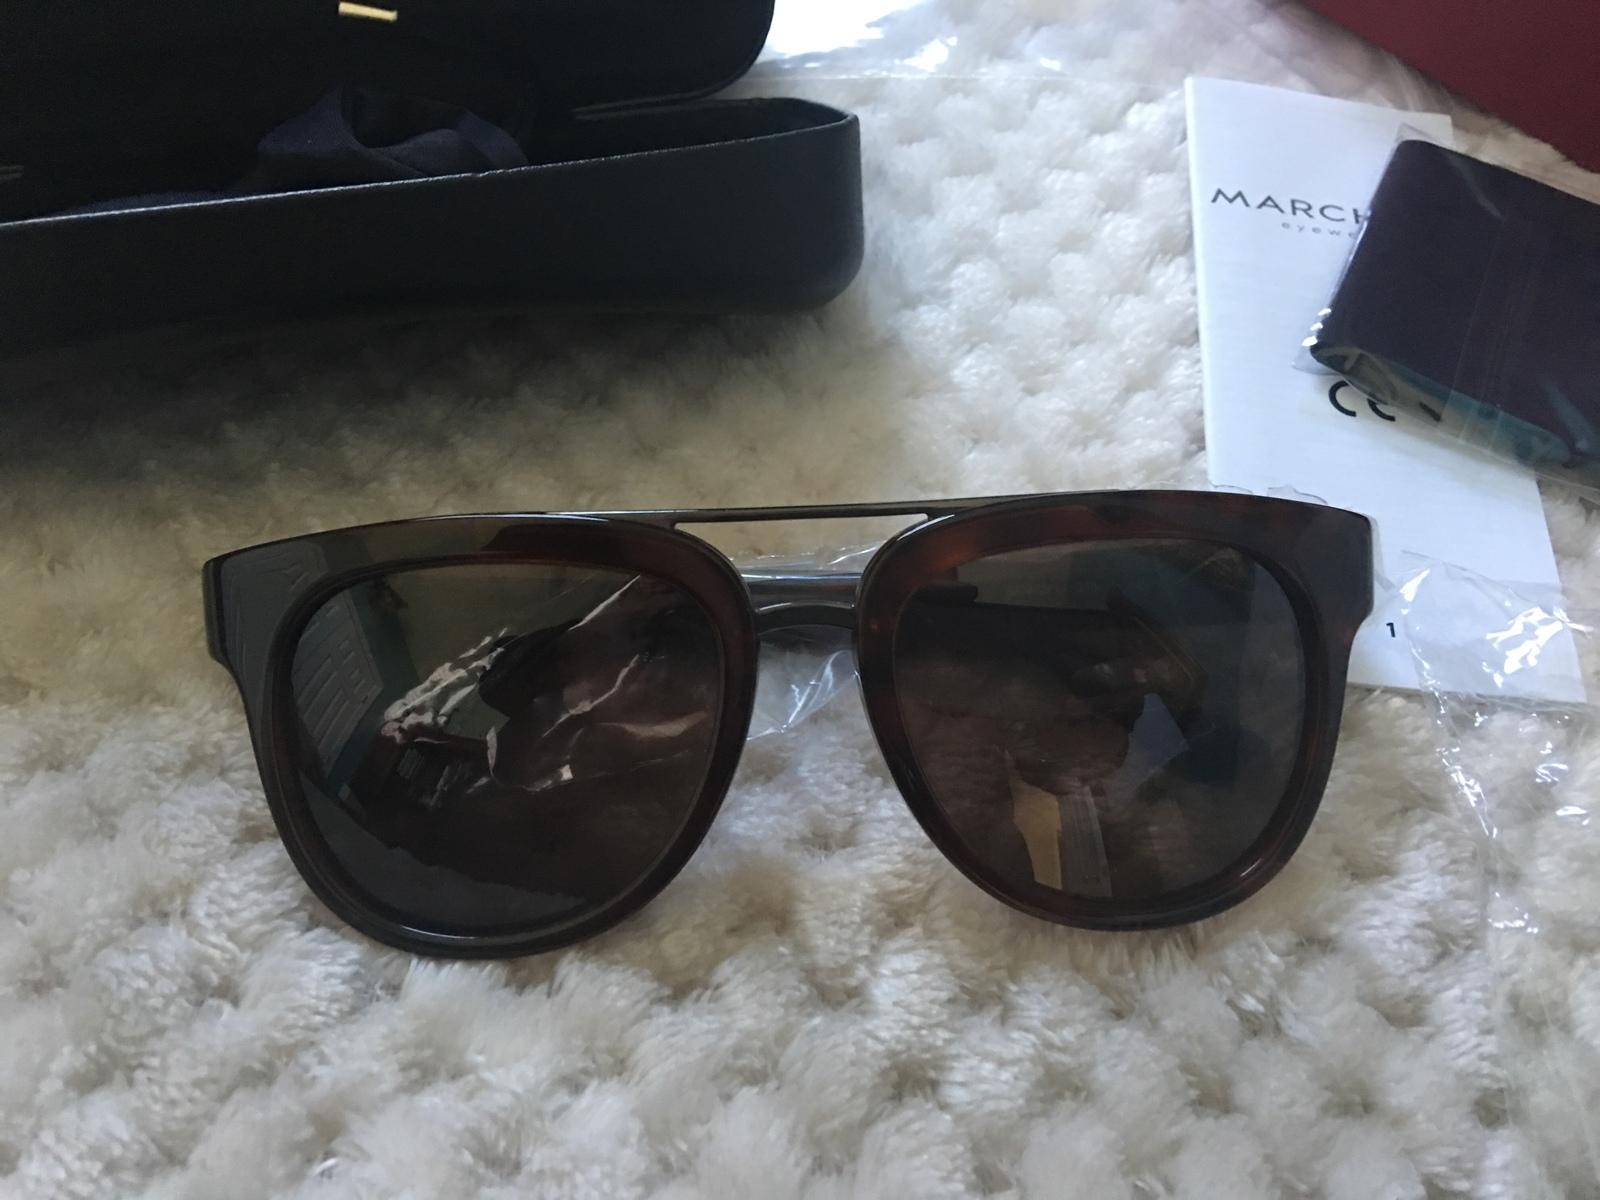 bb0f3749b700 salvatore Ferragamo Mens Sunglasses brown and 29 similar items.  Fullsizeoutput 288b